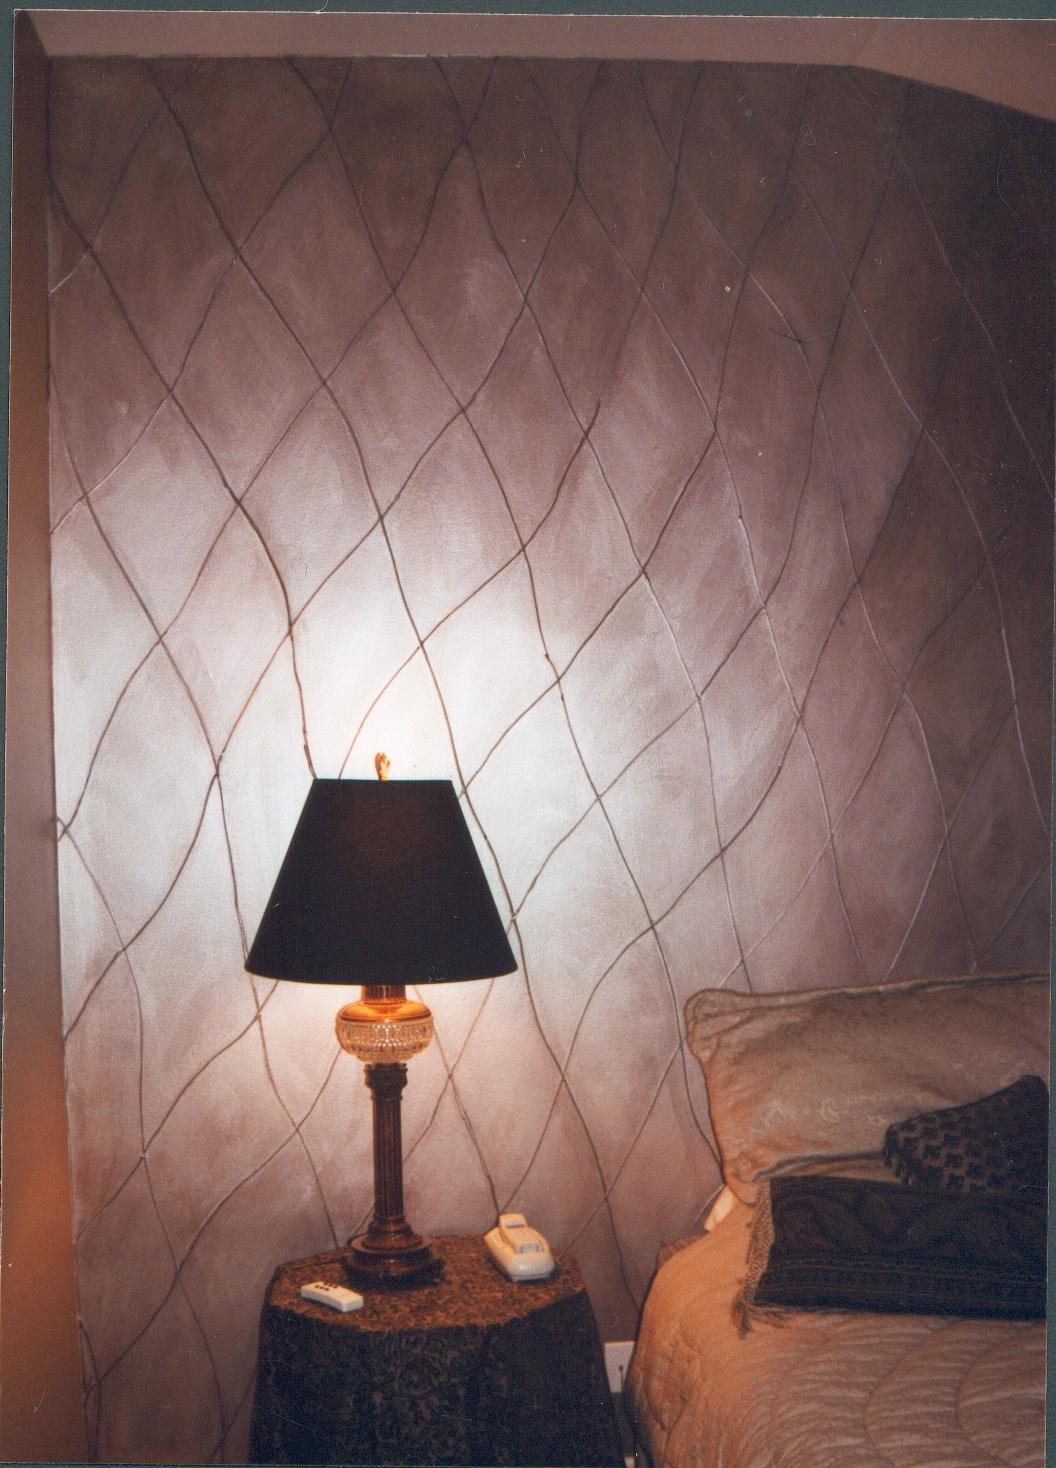 scala-stucco-reflet-1